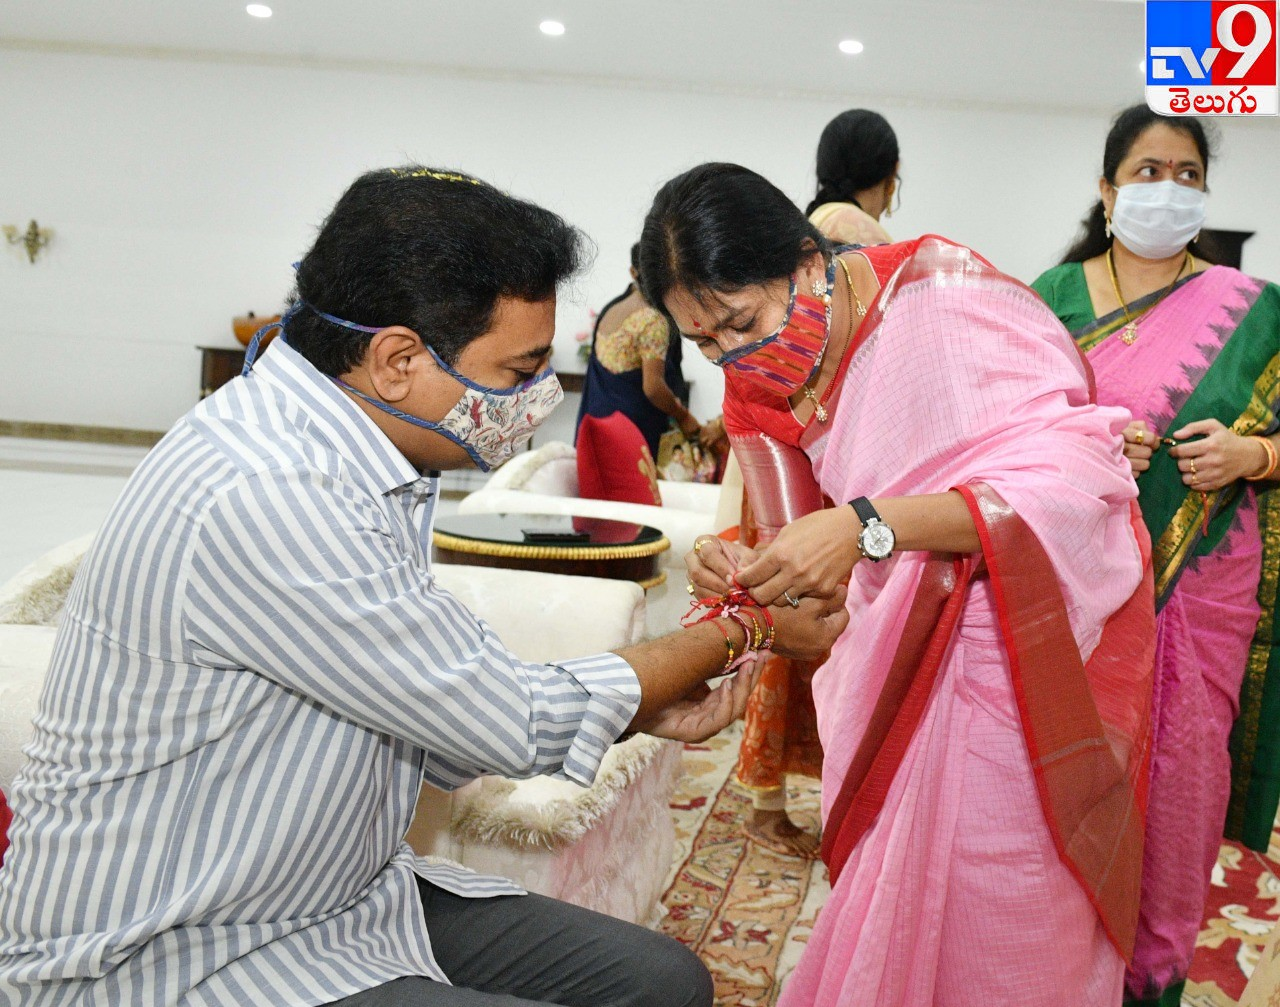 Raksha Bandhan IT Minister KTR, మంత్రి కేటీఆర్కు రాఖీ కట్టిన మాజీ ఎంపీ కవిత